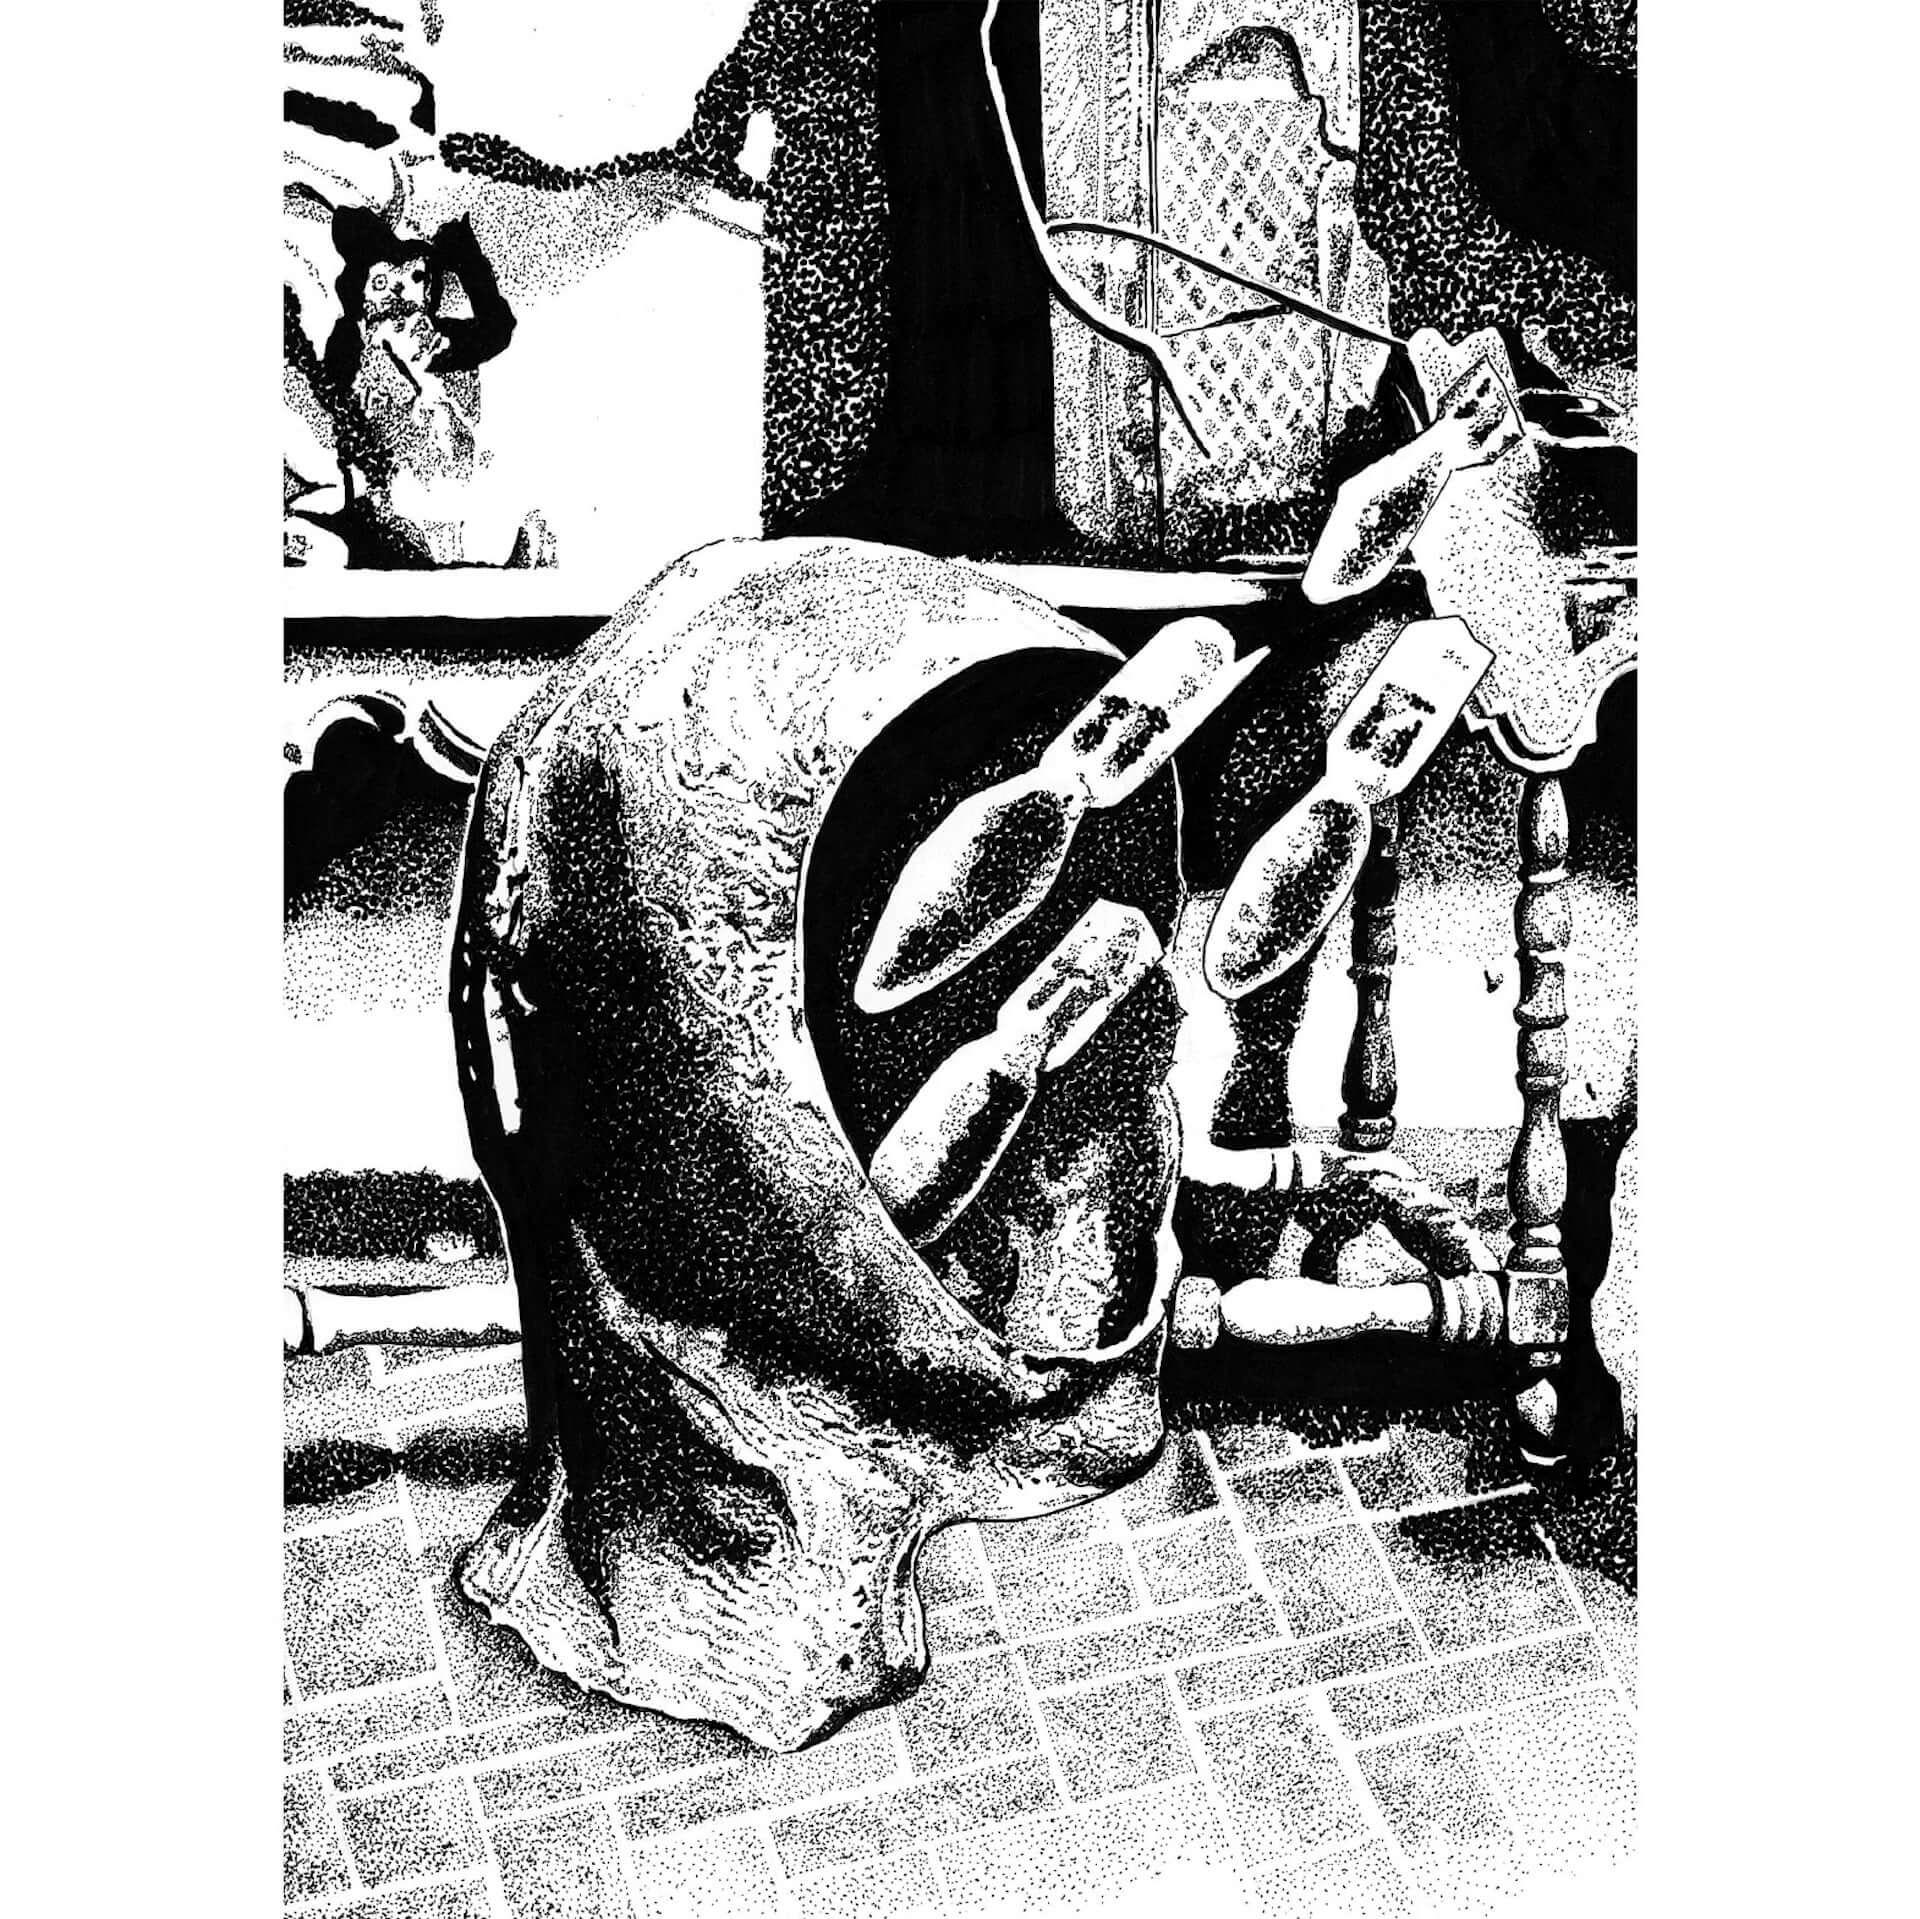 VJ・映像作家としても活躍する悳祐介の個展<DOTS>がLAID BUGにて開催決定!モノクロームの点描画作品を多数展示 art210304_yusuke-isao_2-1920x1919